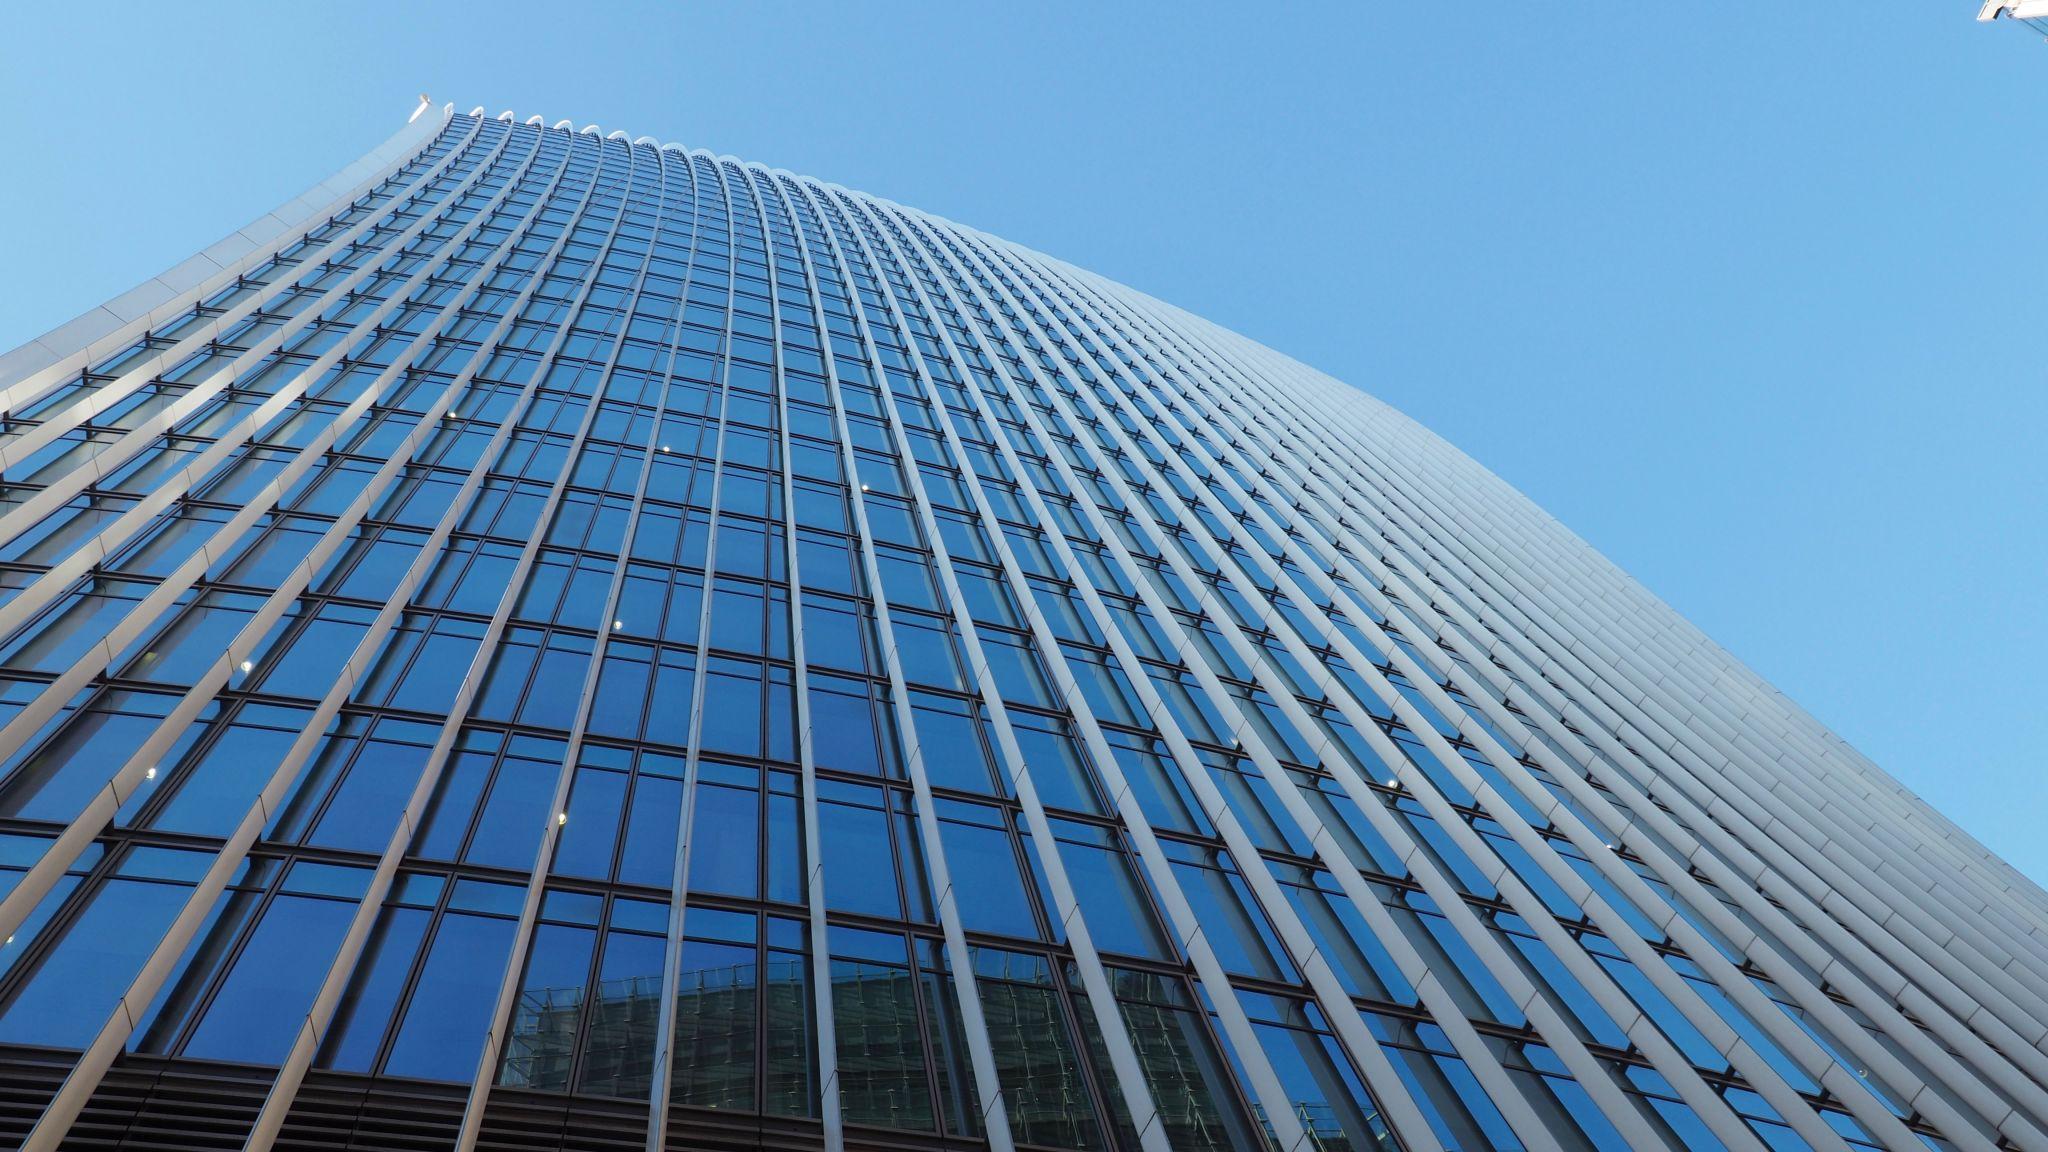 Walkie-talkie building, United Kingdom